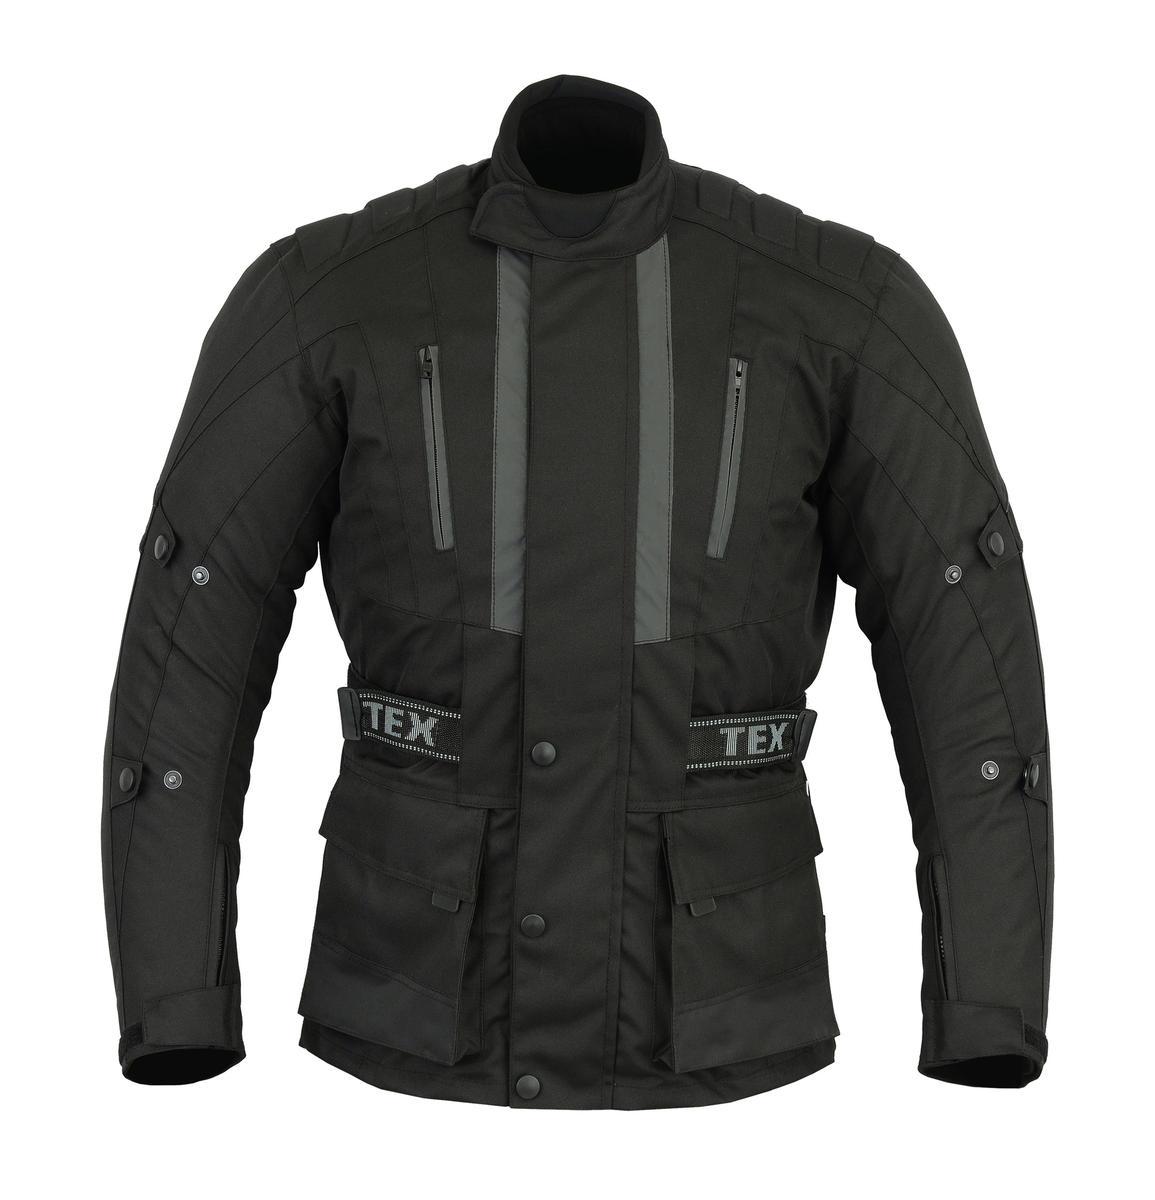 Motorbike Motorcycle Jacket CE Protective Armour Waterproof Thermal Biker Lining